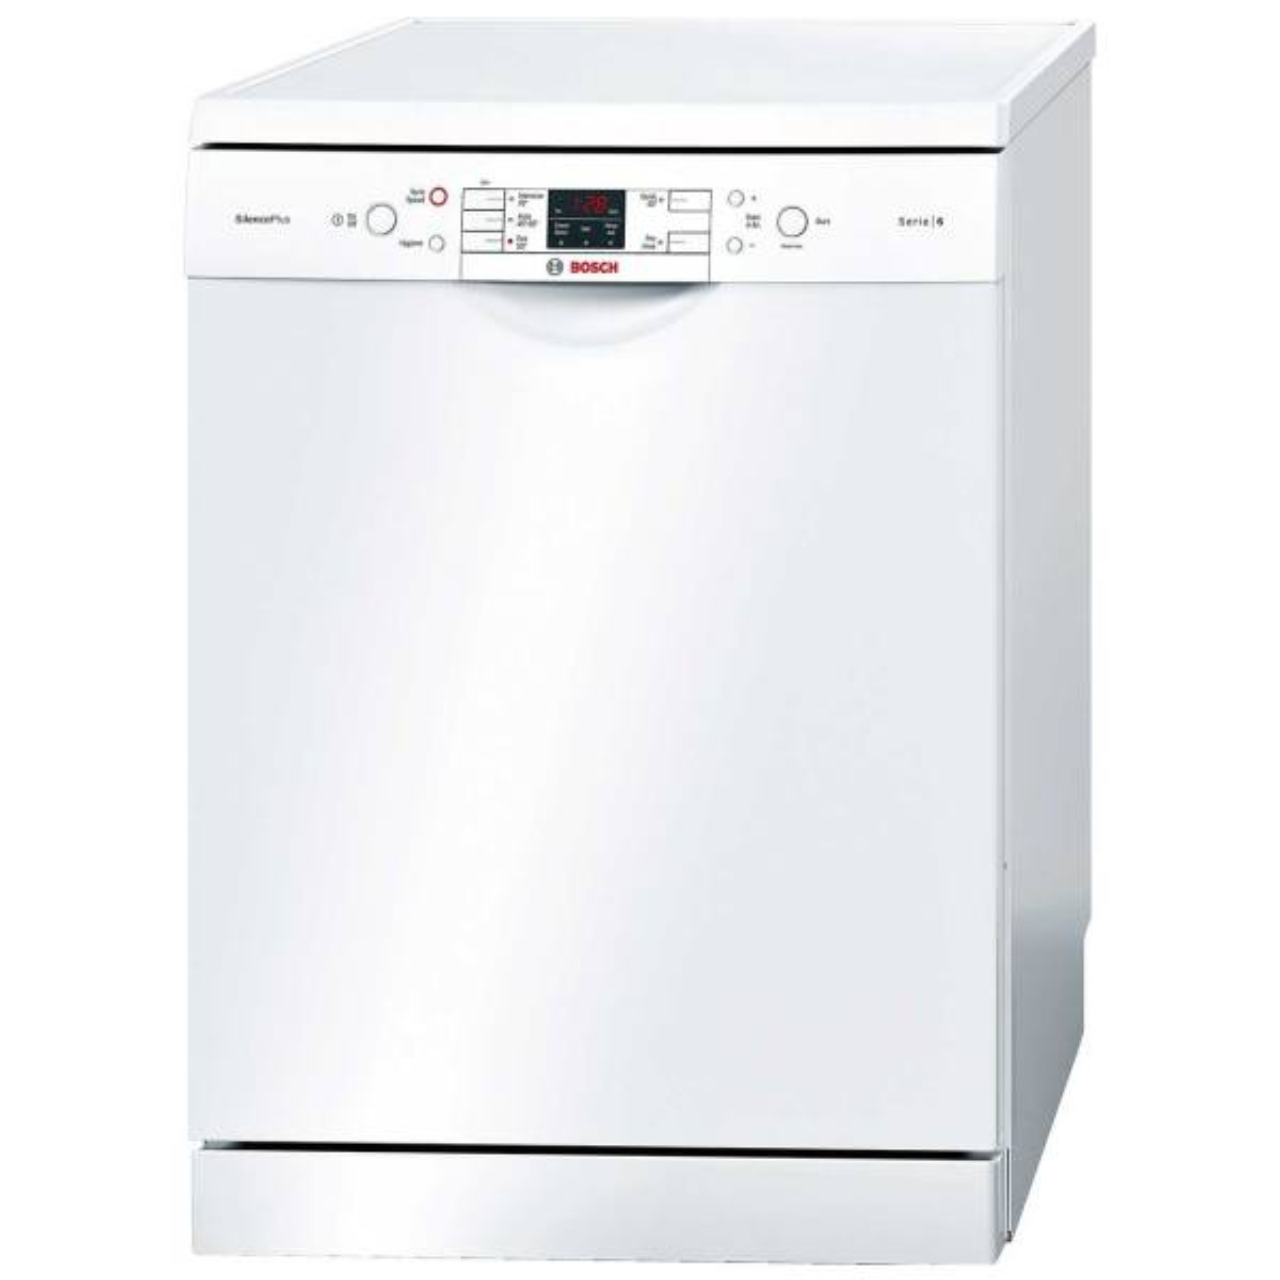 ماشین ظرفشویی بوش مدل  SMS58M02IR | Bosch SMS58M02IR Dishwasher